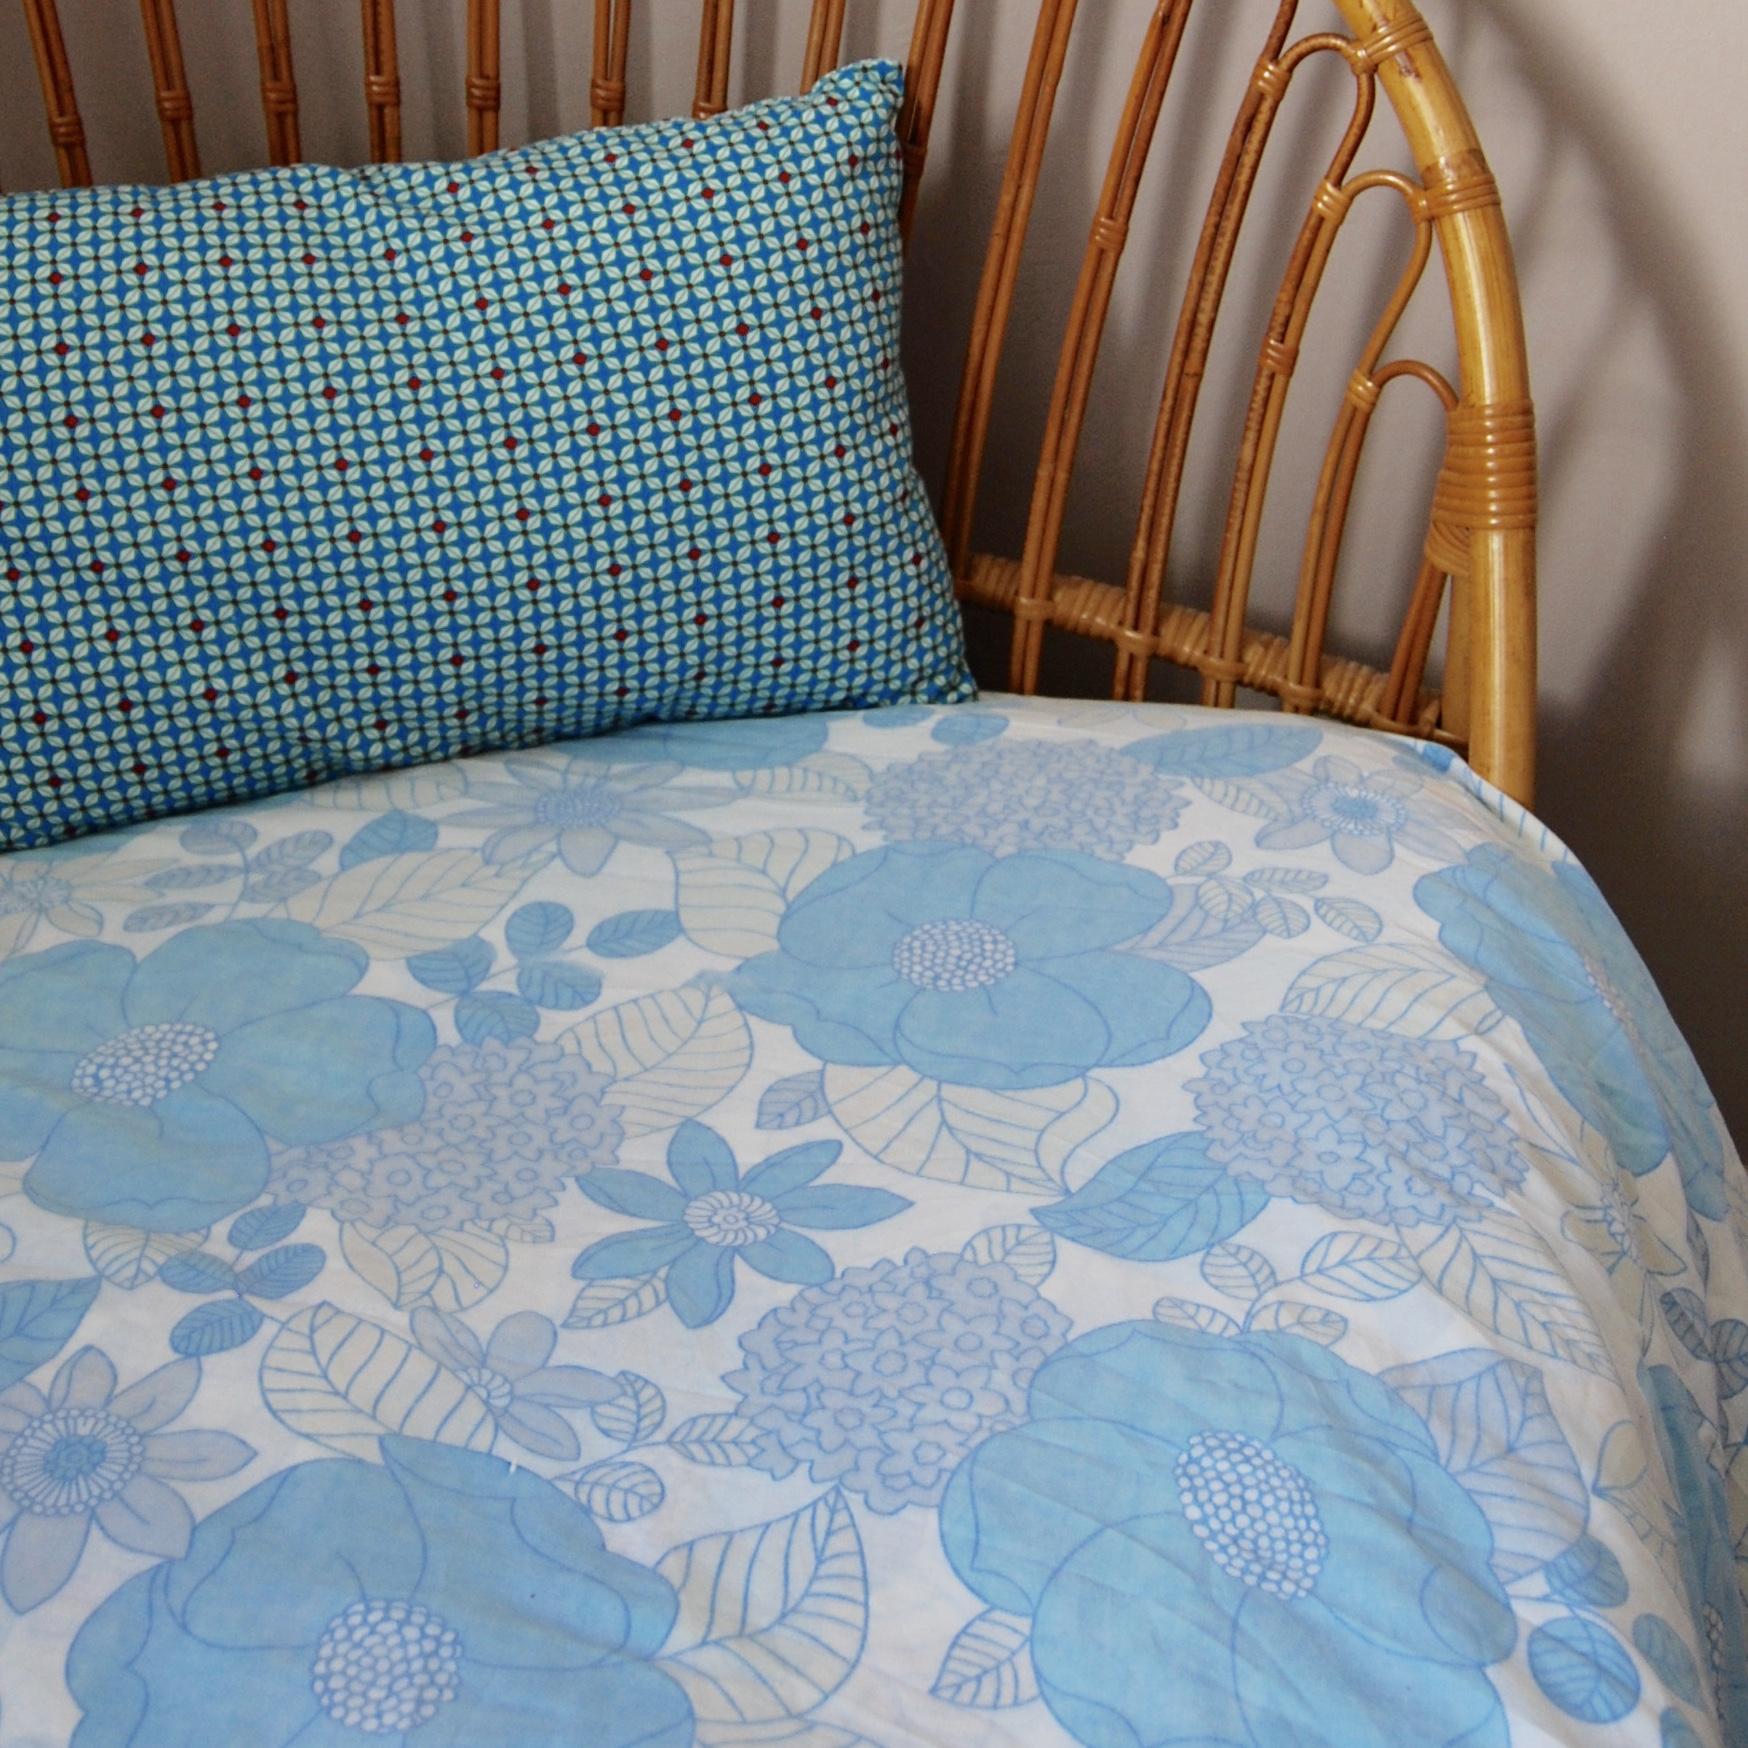 drap plat vintage 2 personnes brocante avenue. Black Bedroom Furniture Sets. Home Design Ideas